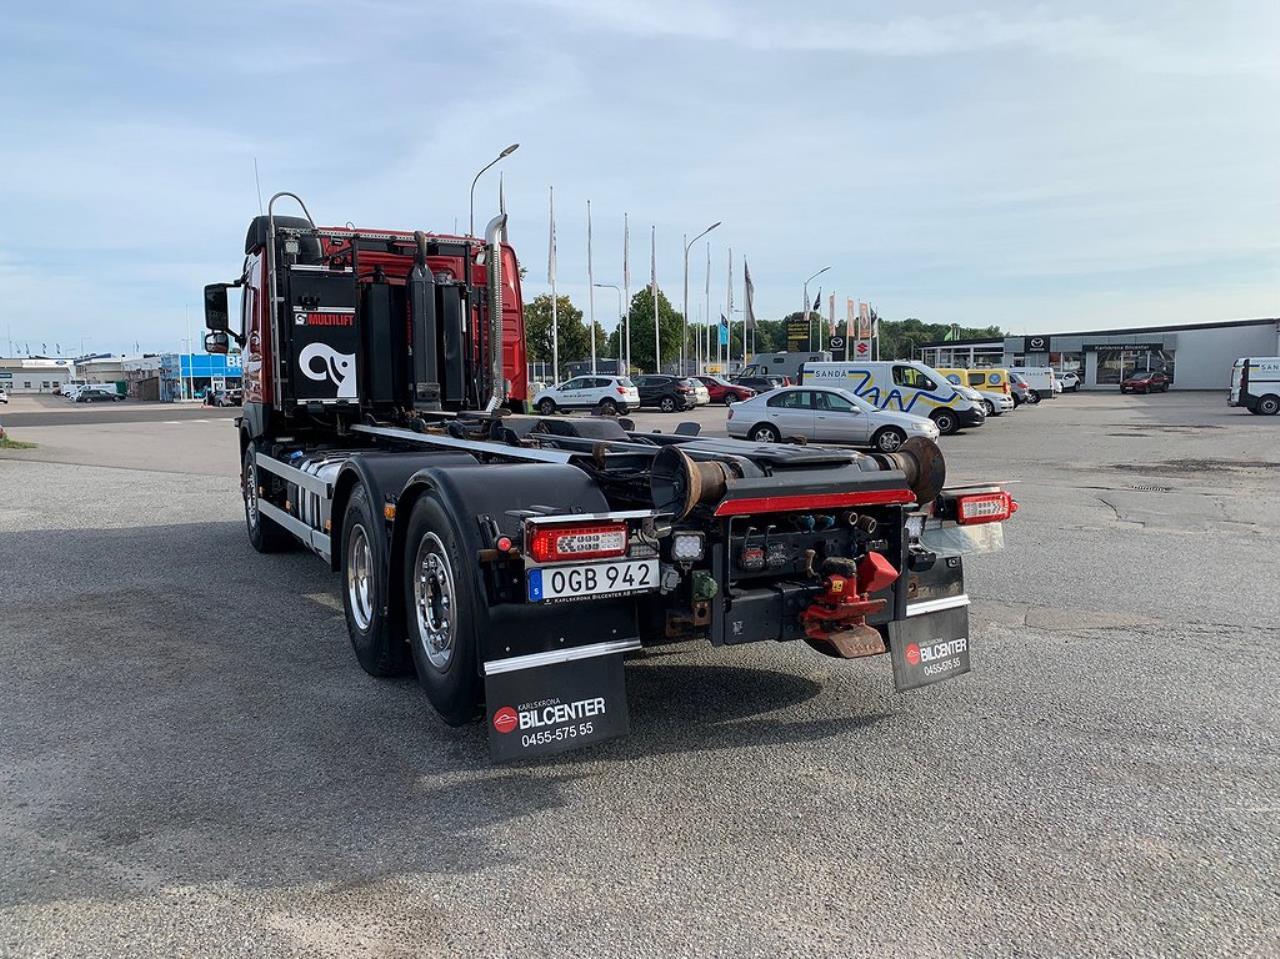 Volvo FM13 450 6x2*4 Lastväxlare Plogutrustad  2016 - Krok/Lastväxlare